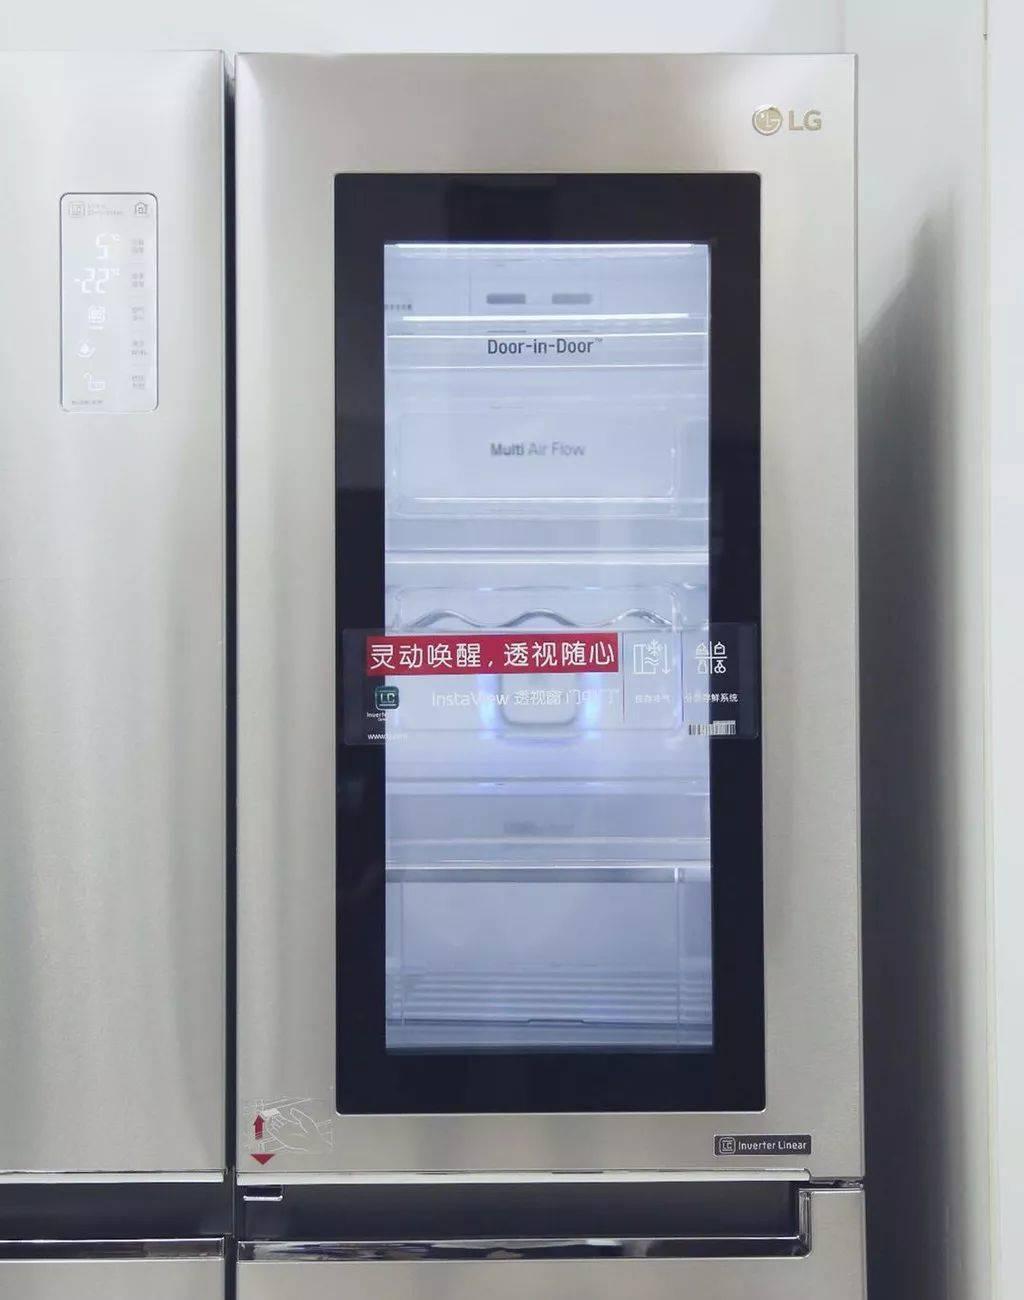 LG InstaView透视窗门中门冰箱:真•高端冰箱了解一下_今天